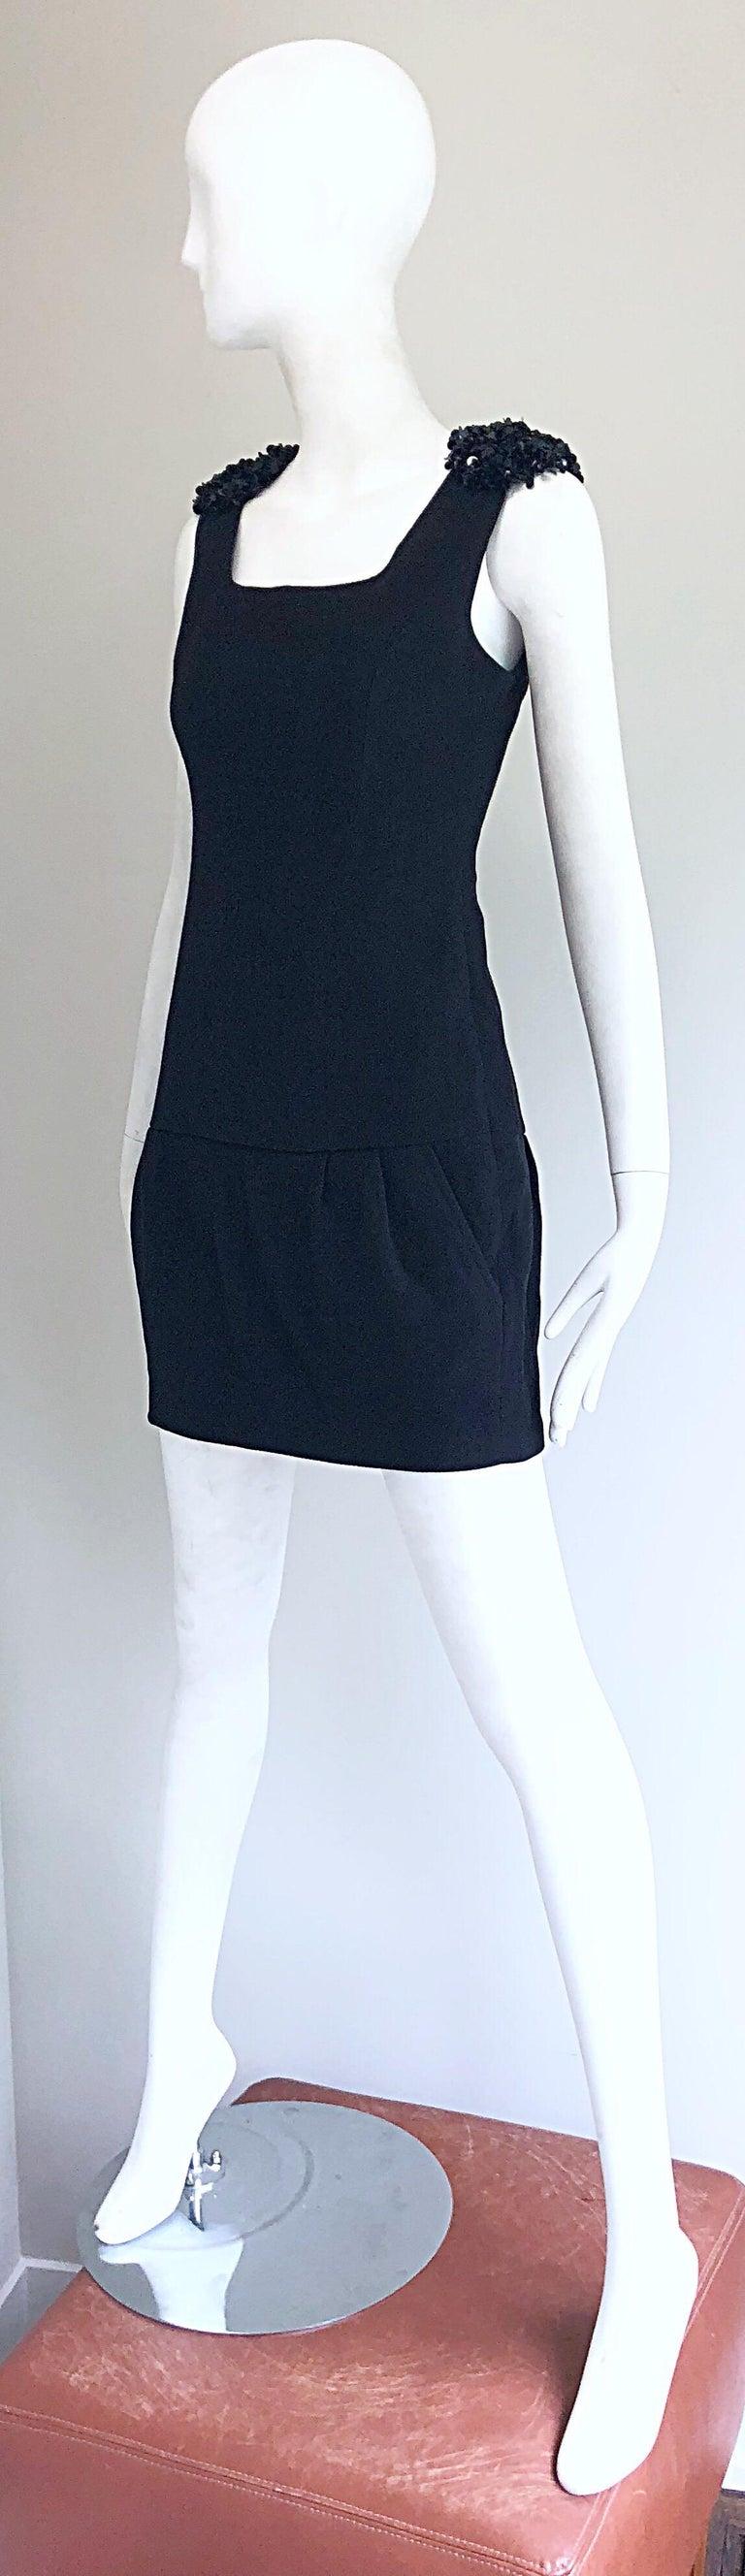 1990s Miu Miu Black Virgin Wool Sequin Beaded Vintage 90s Mini Dress For Sale 3